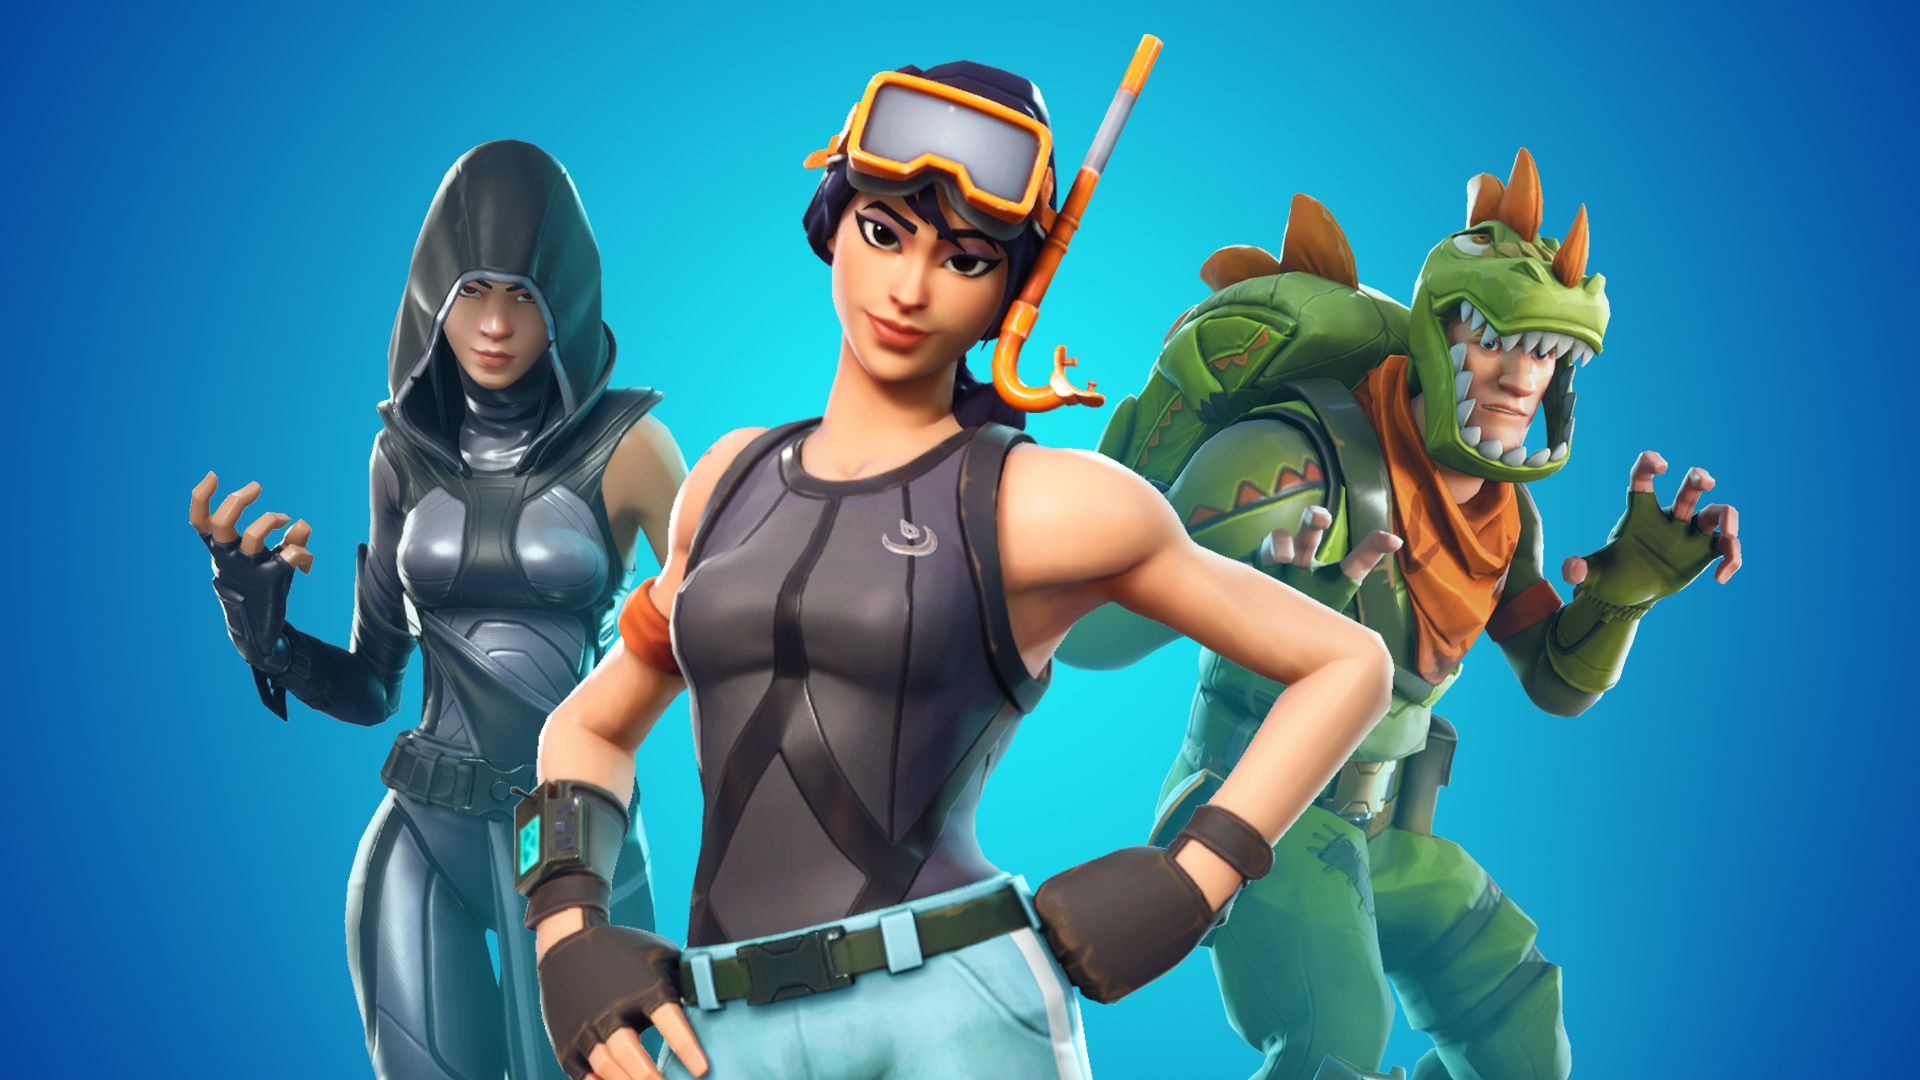 Fortnite Hack 100% Working for 2018 | Battle royale game ...